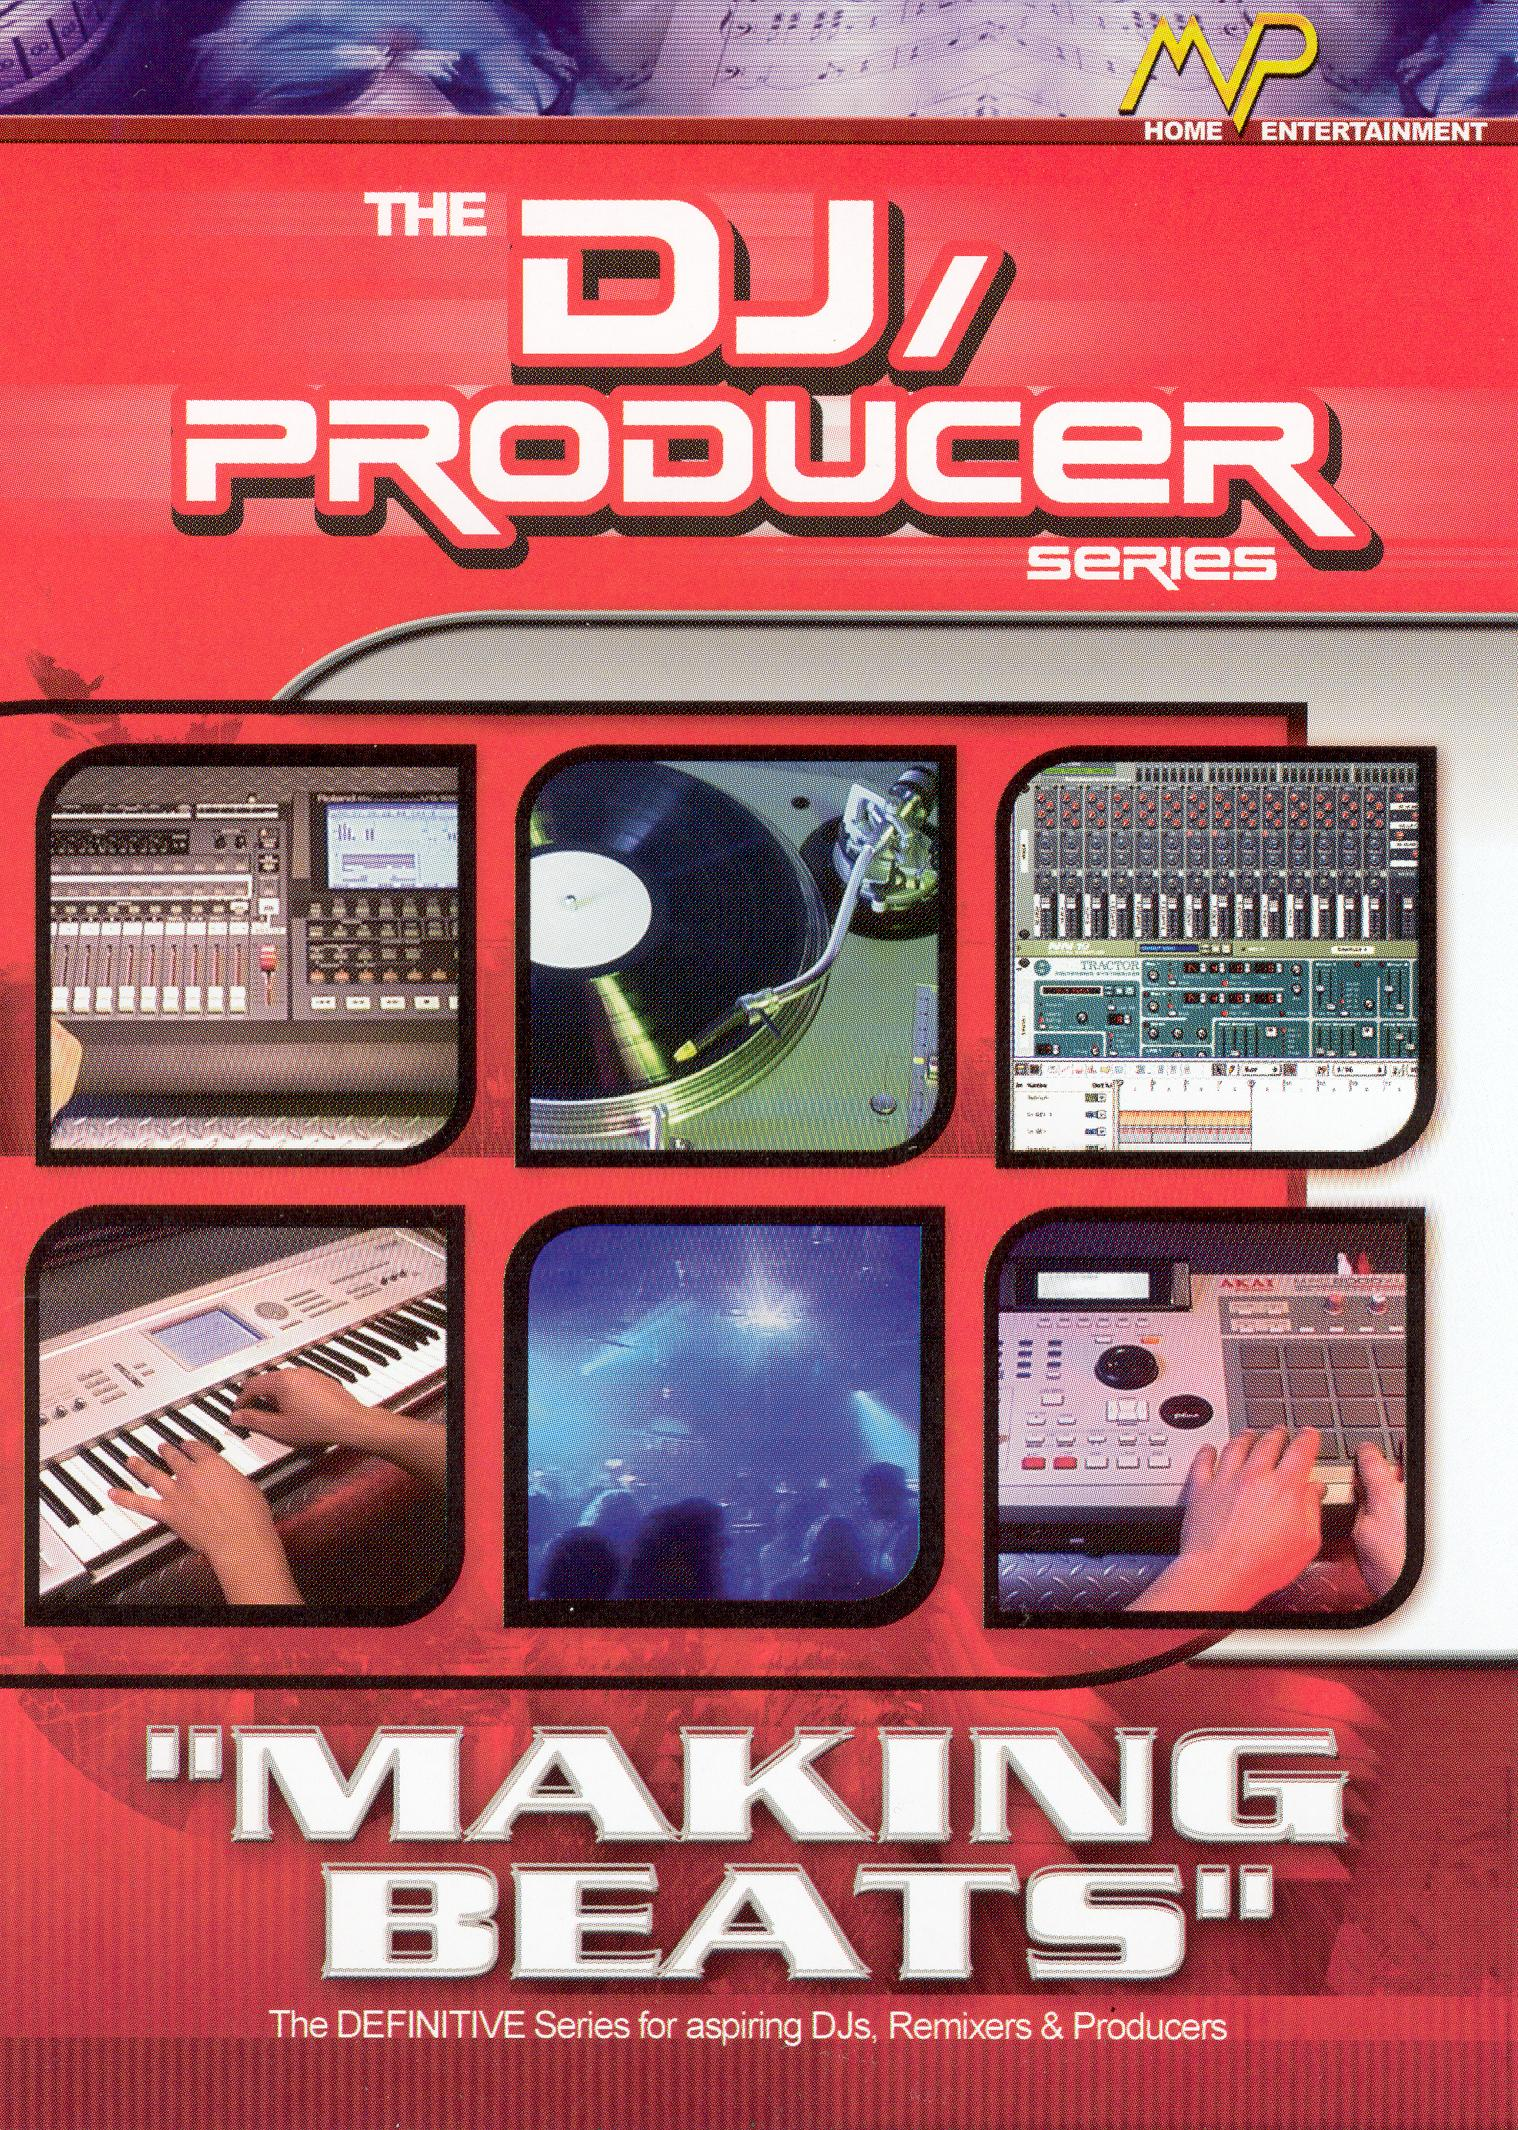 DJ/Producer: Making Beats